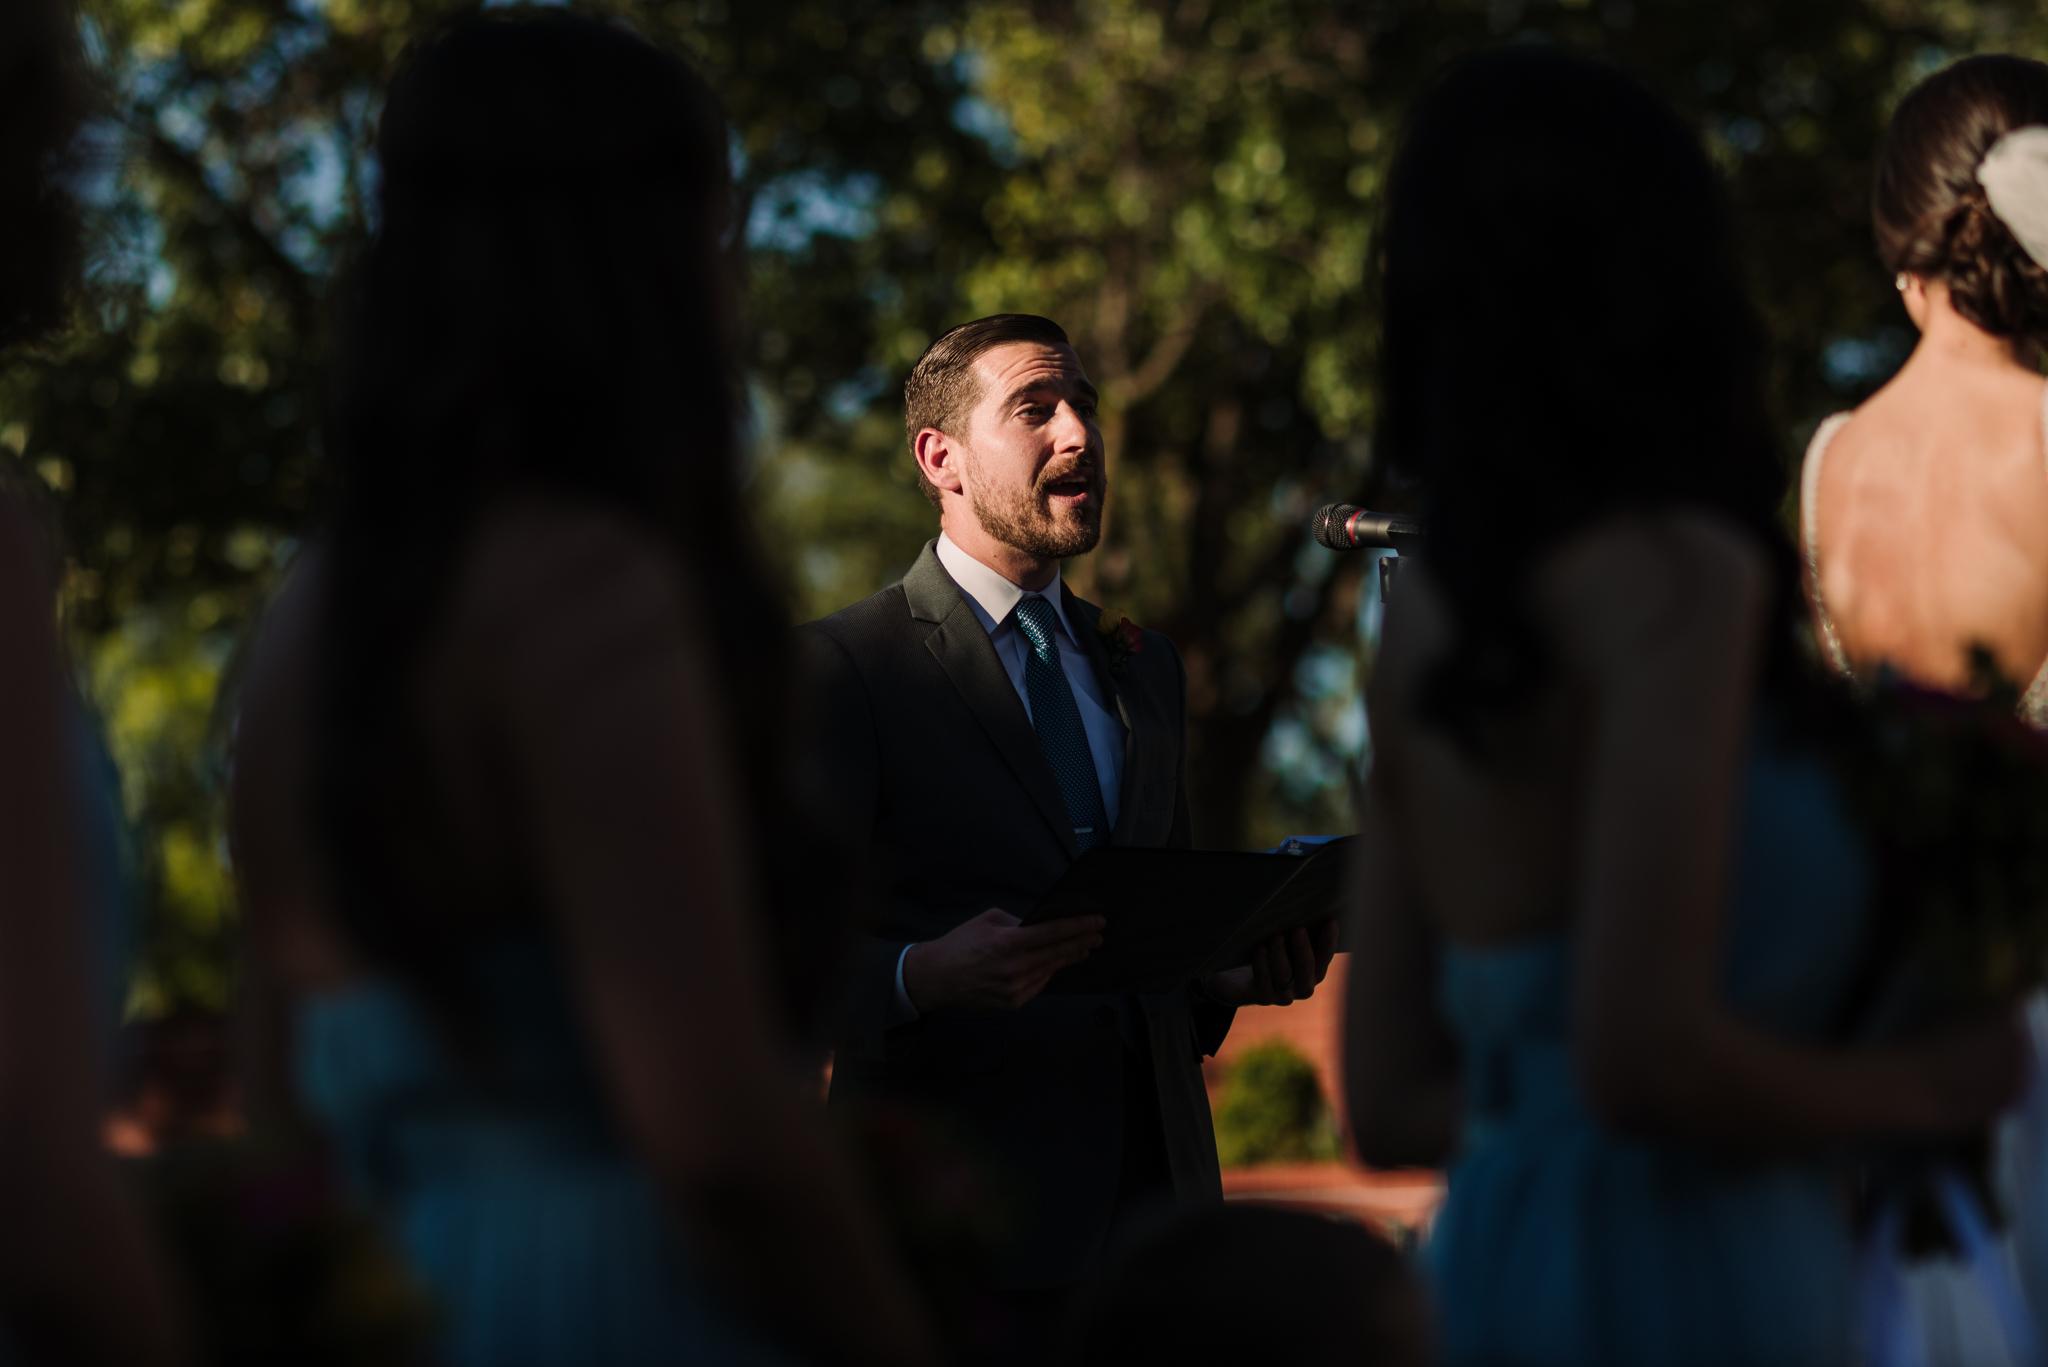 Oklahoma-Christian-University-Wedding-0342.jpg